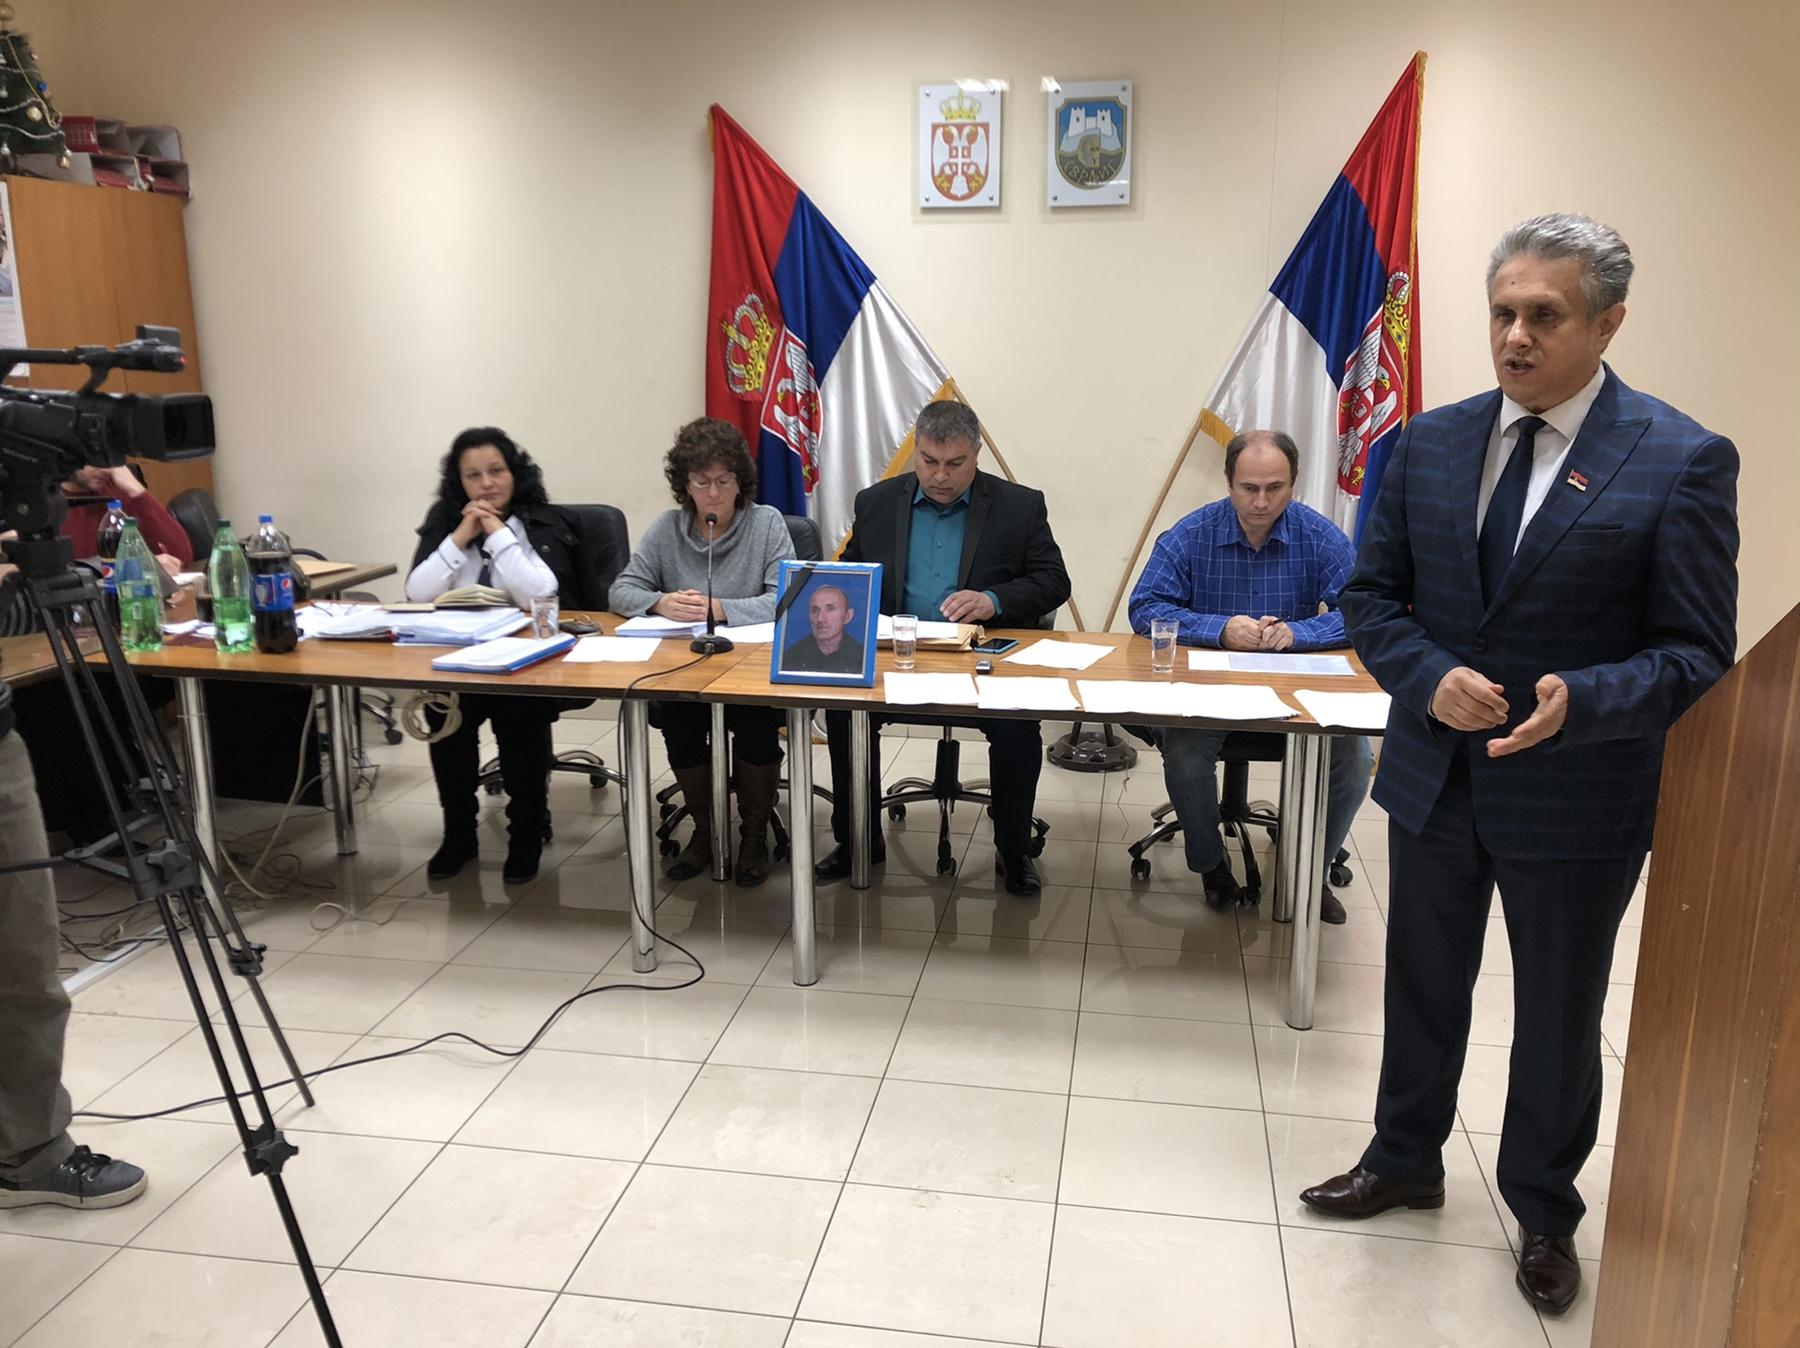 Poslednji pozdrav odborniku Ljubinku Đorđeviću, foto: M. Miladinović